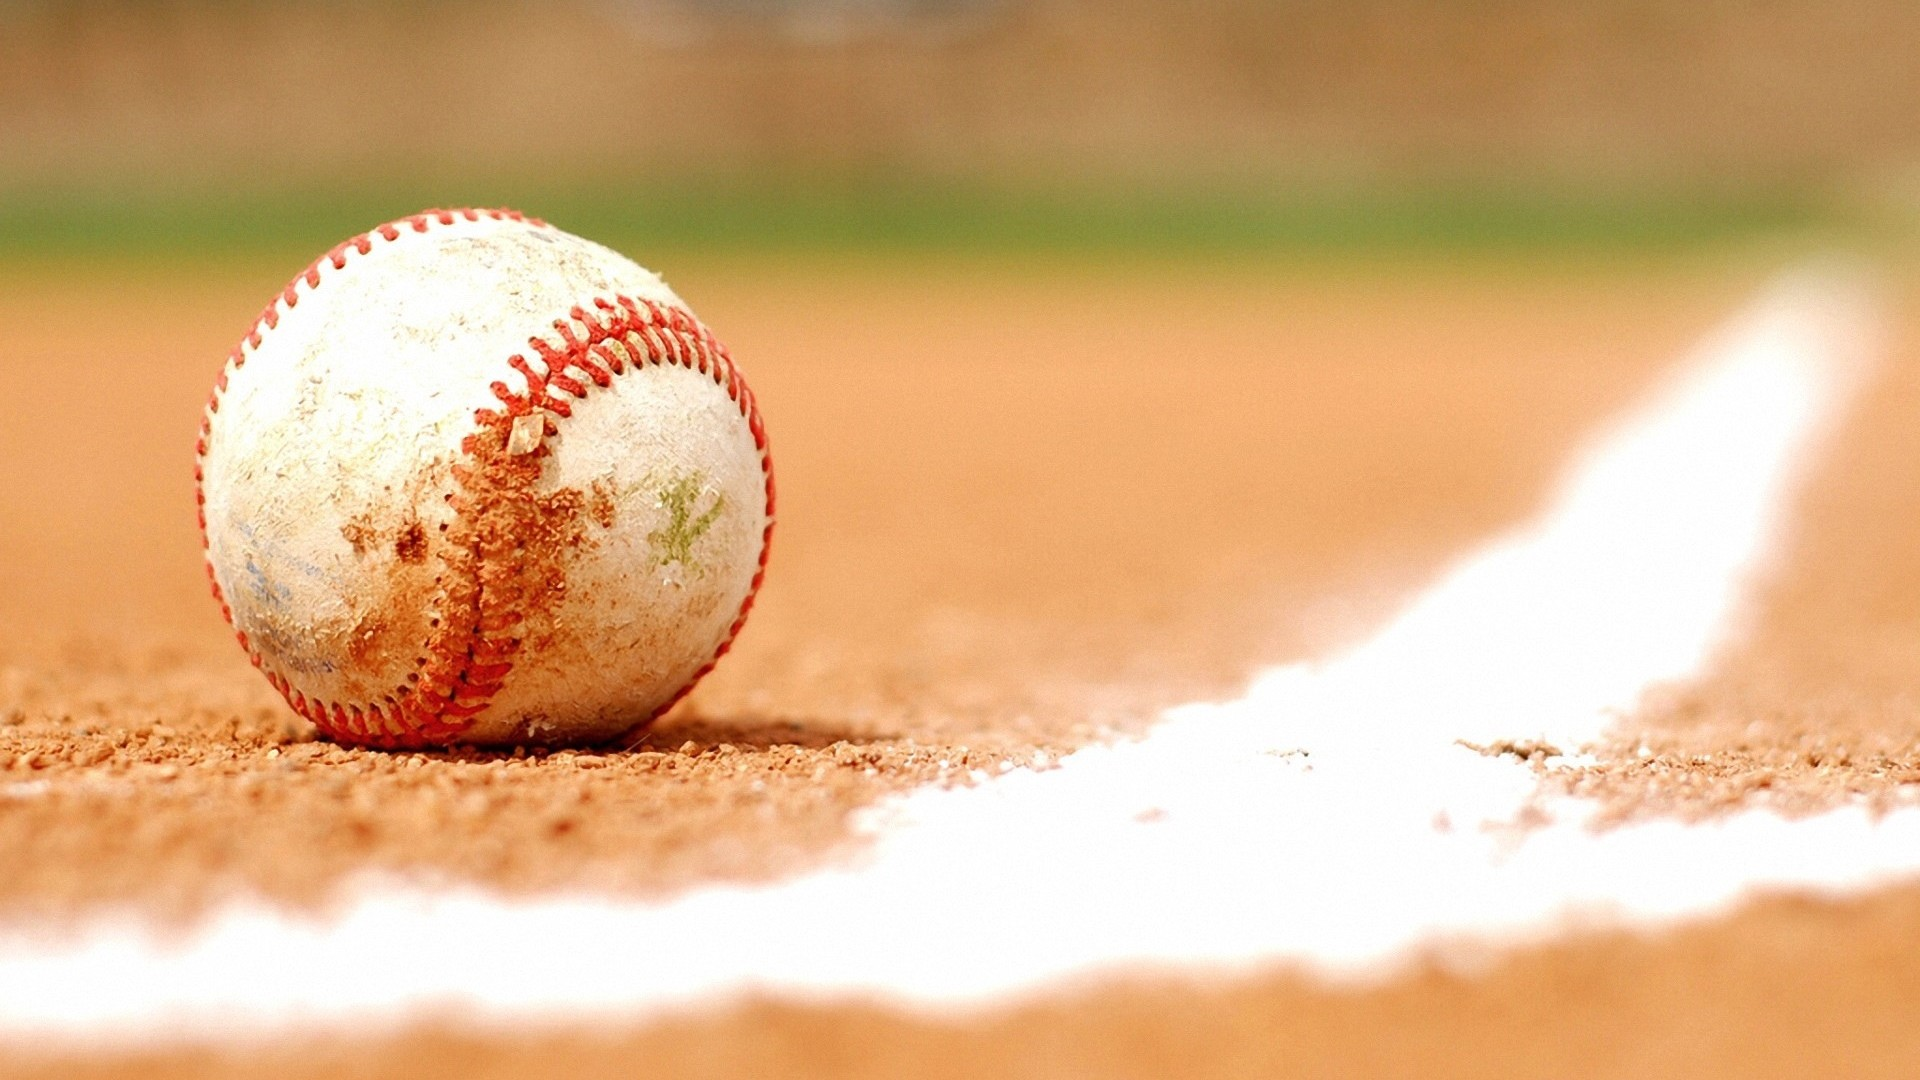 Ball and baseball field wallpaper: